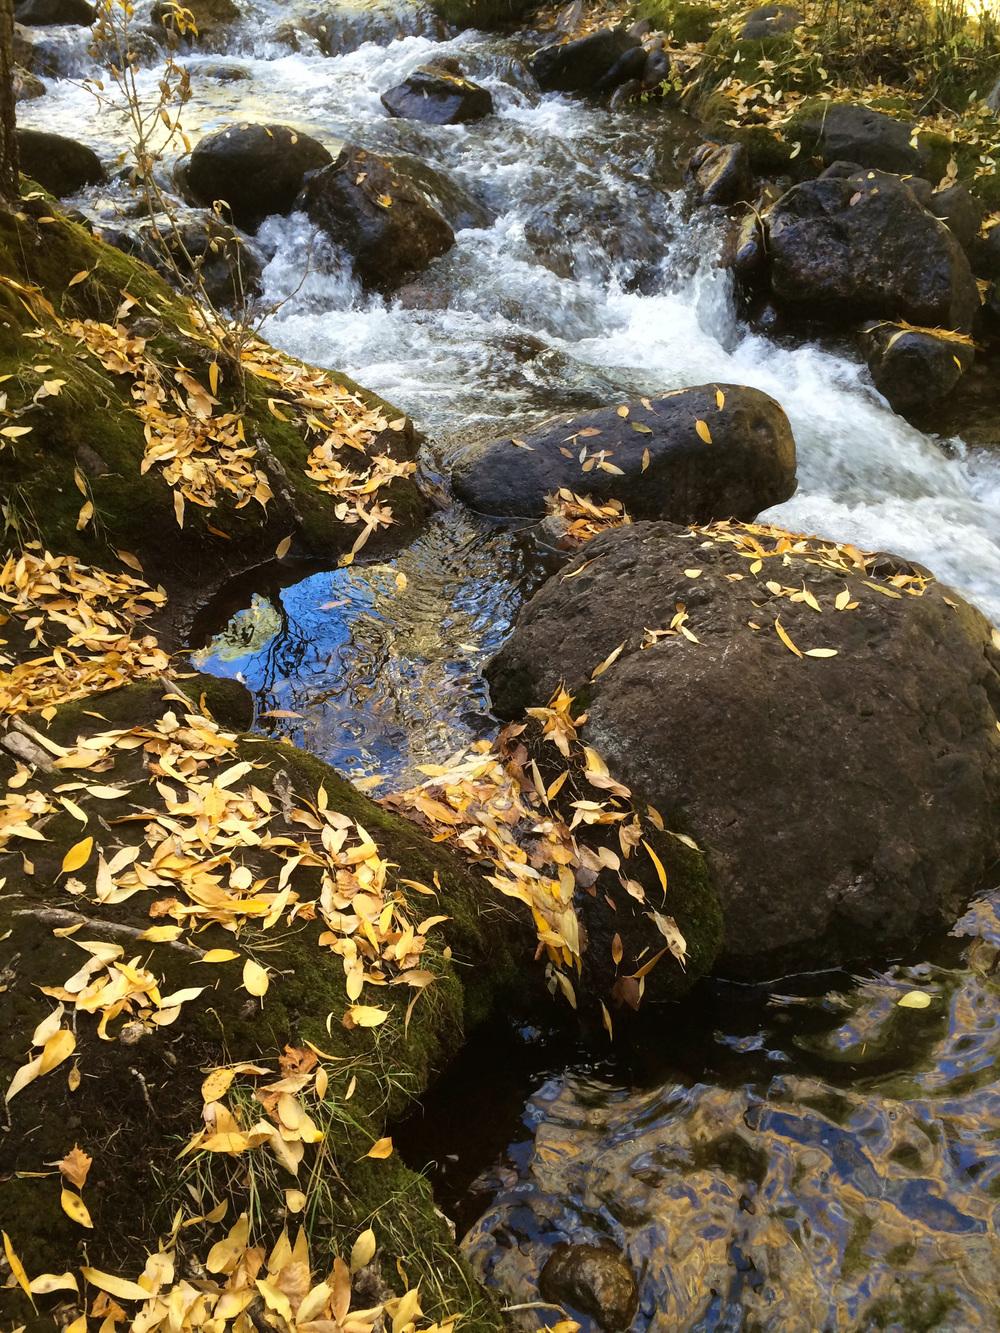 north crestone creek in early november, 2014